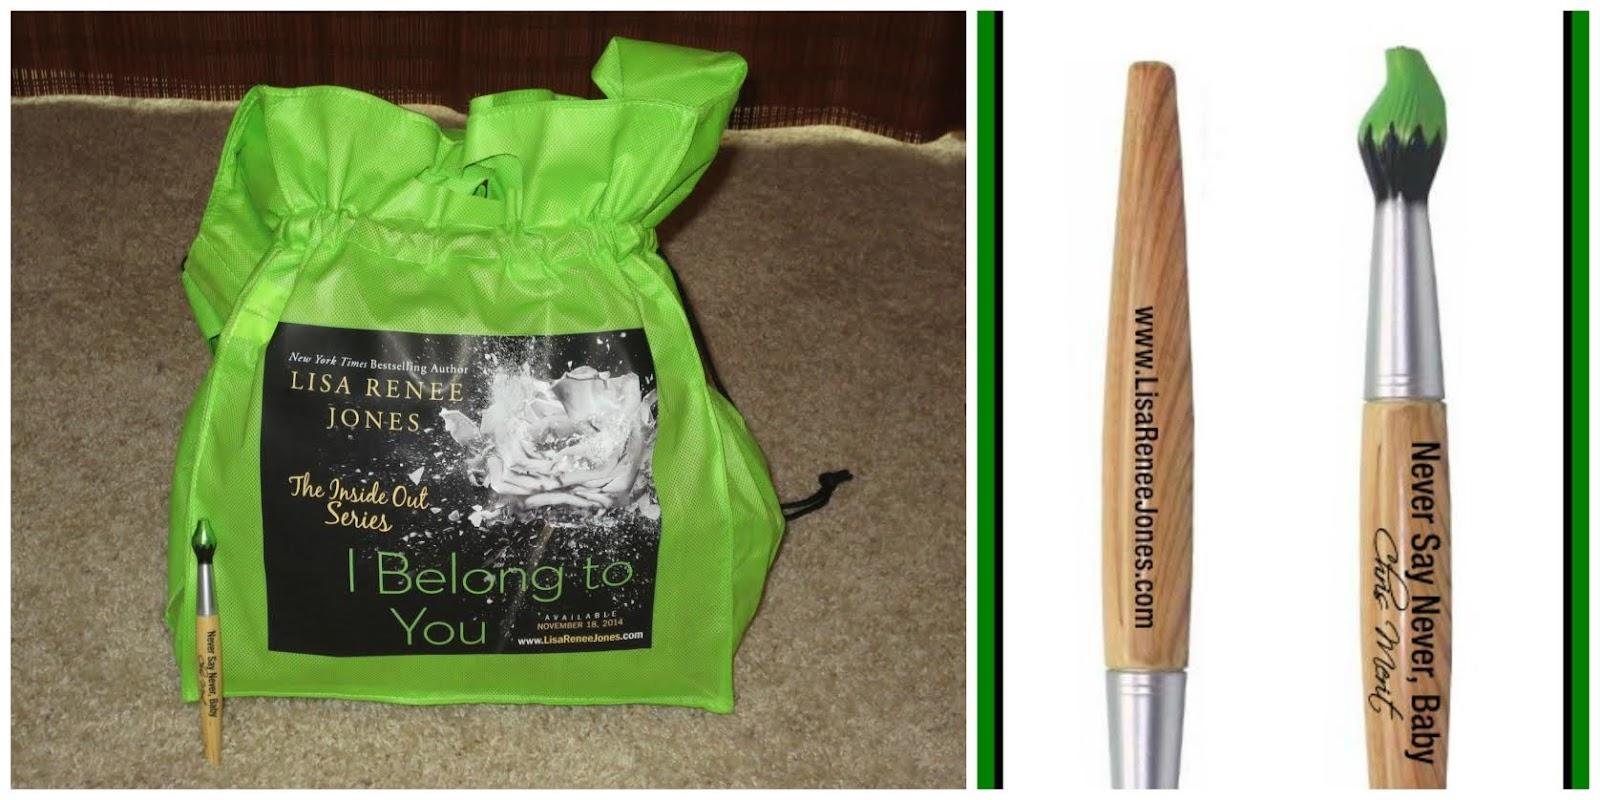 bag & pens ppbk.jpg